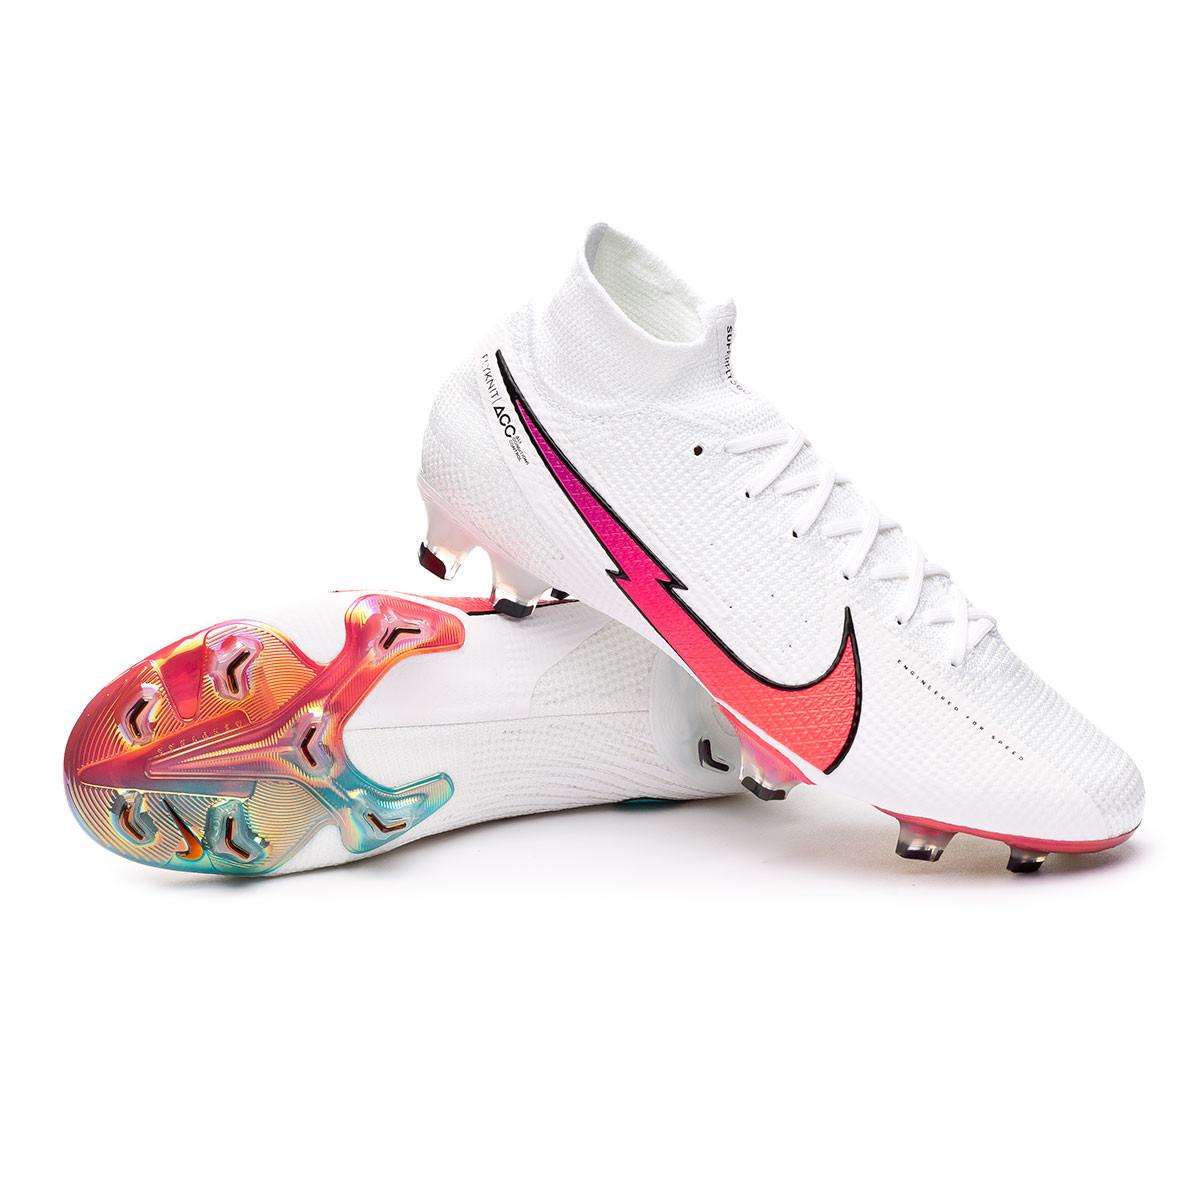 Chaussure de foot Nike Mercurial Superfly VII Elite FG White-Flash ...